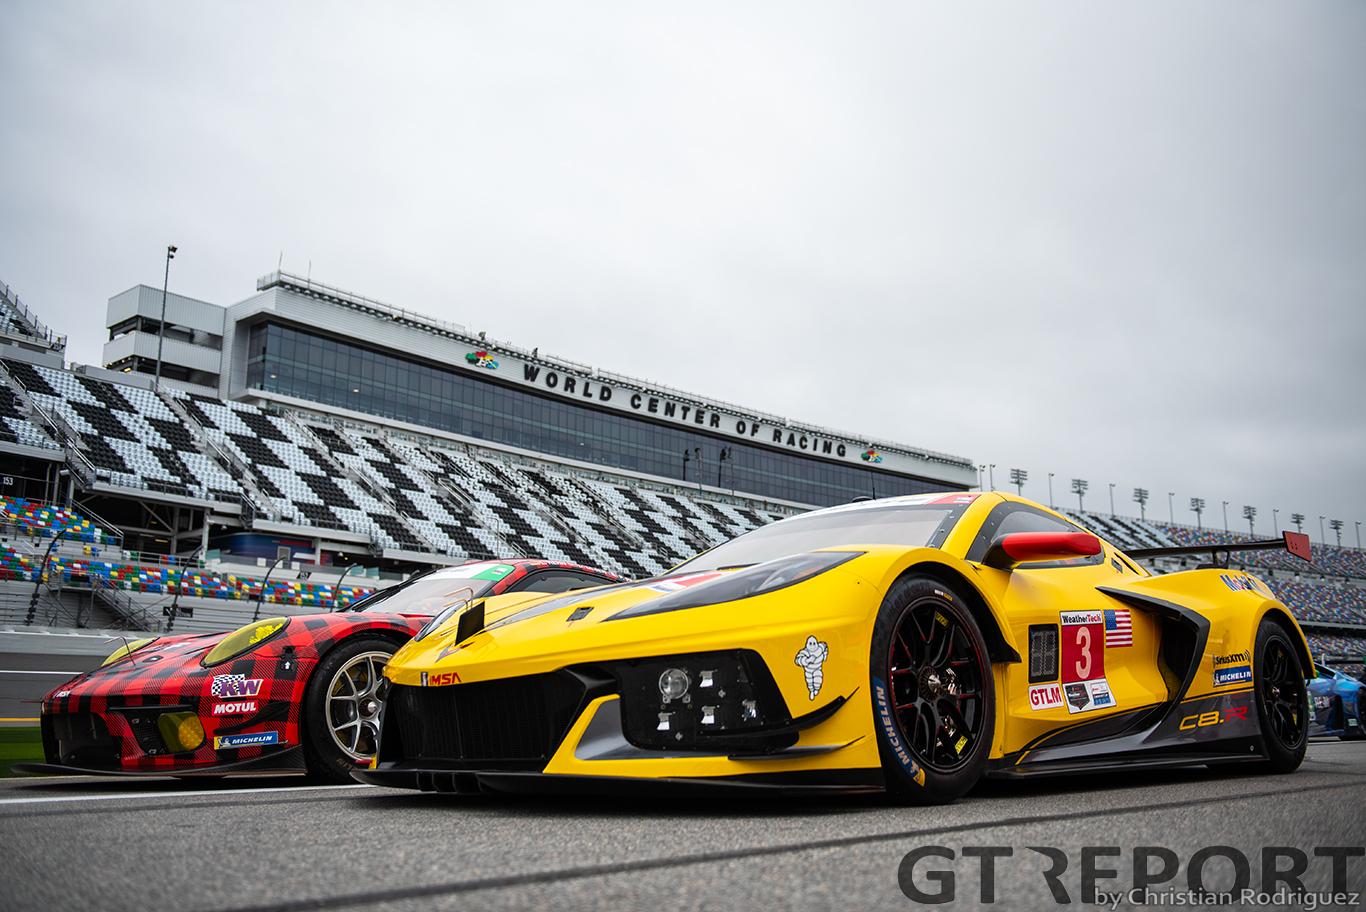 Corvette C8.R: Racecar first, road car second